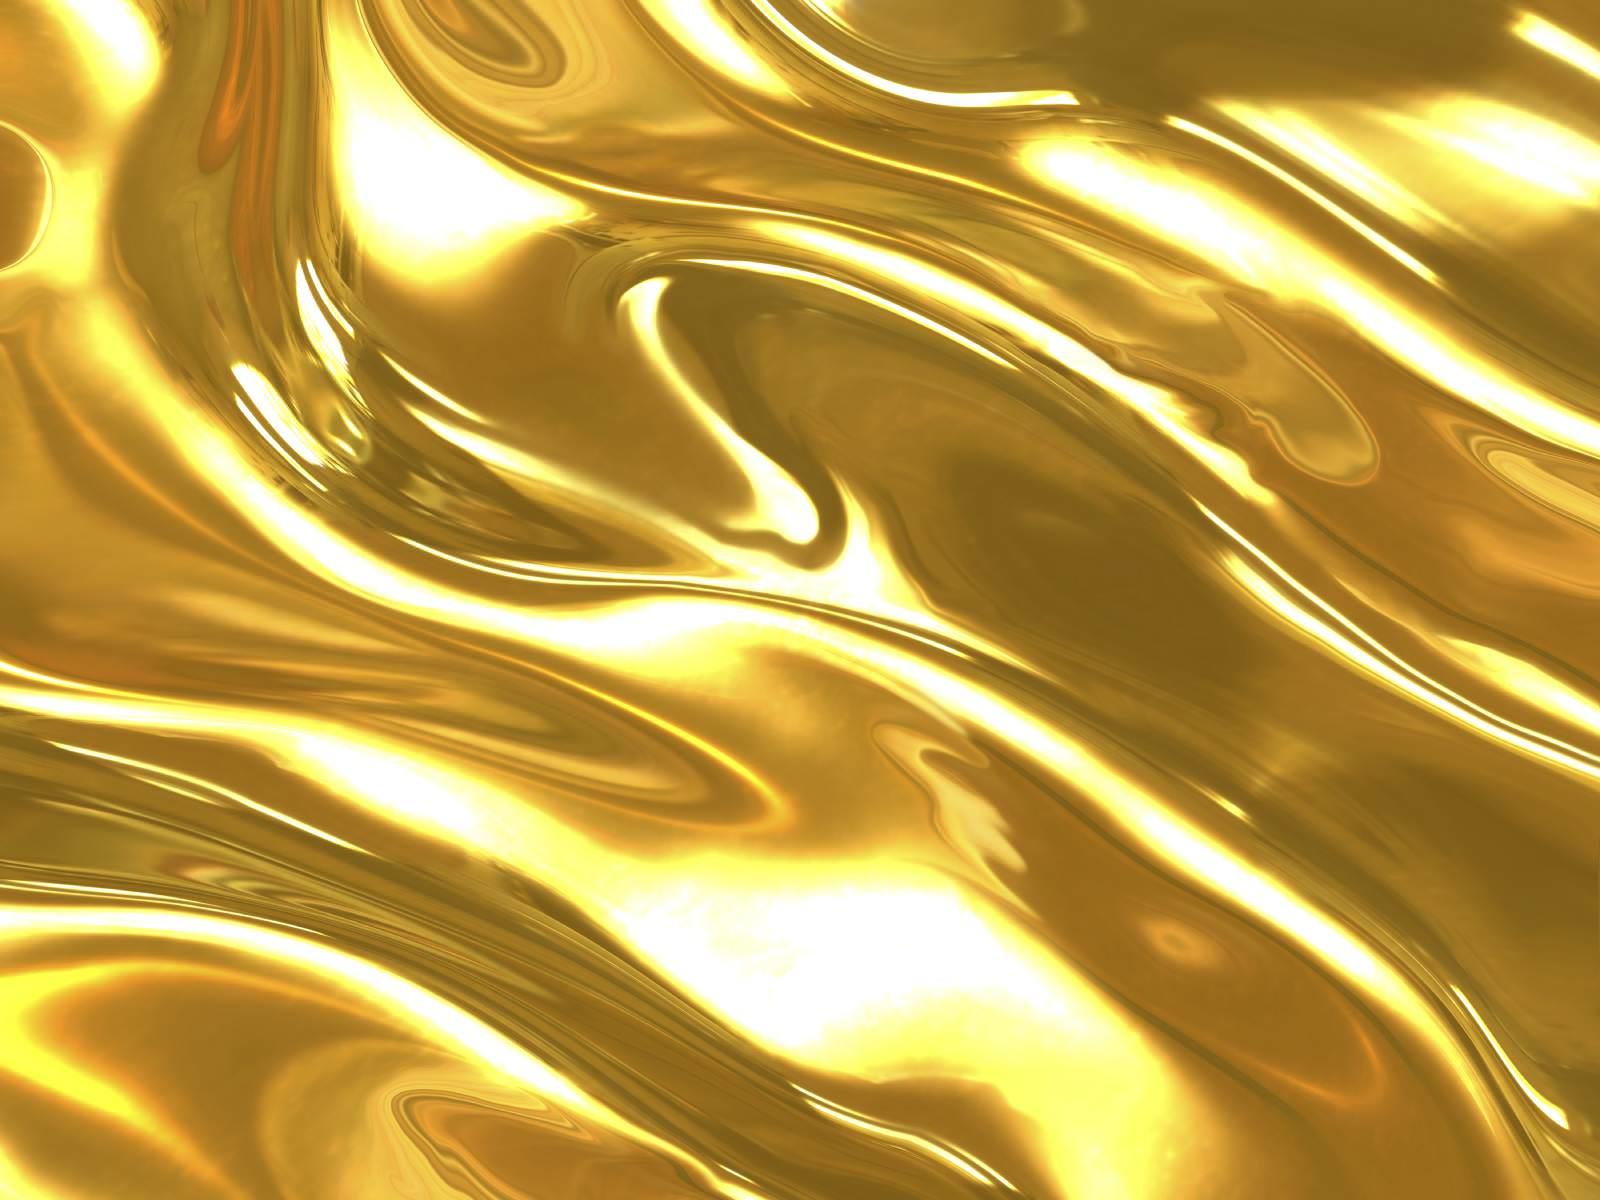 Liquid Gold Wallpapers Top Free Liquid Gold Backgrounds Wallpaperaccess